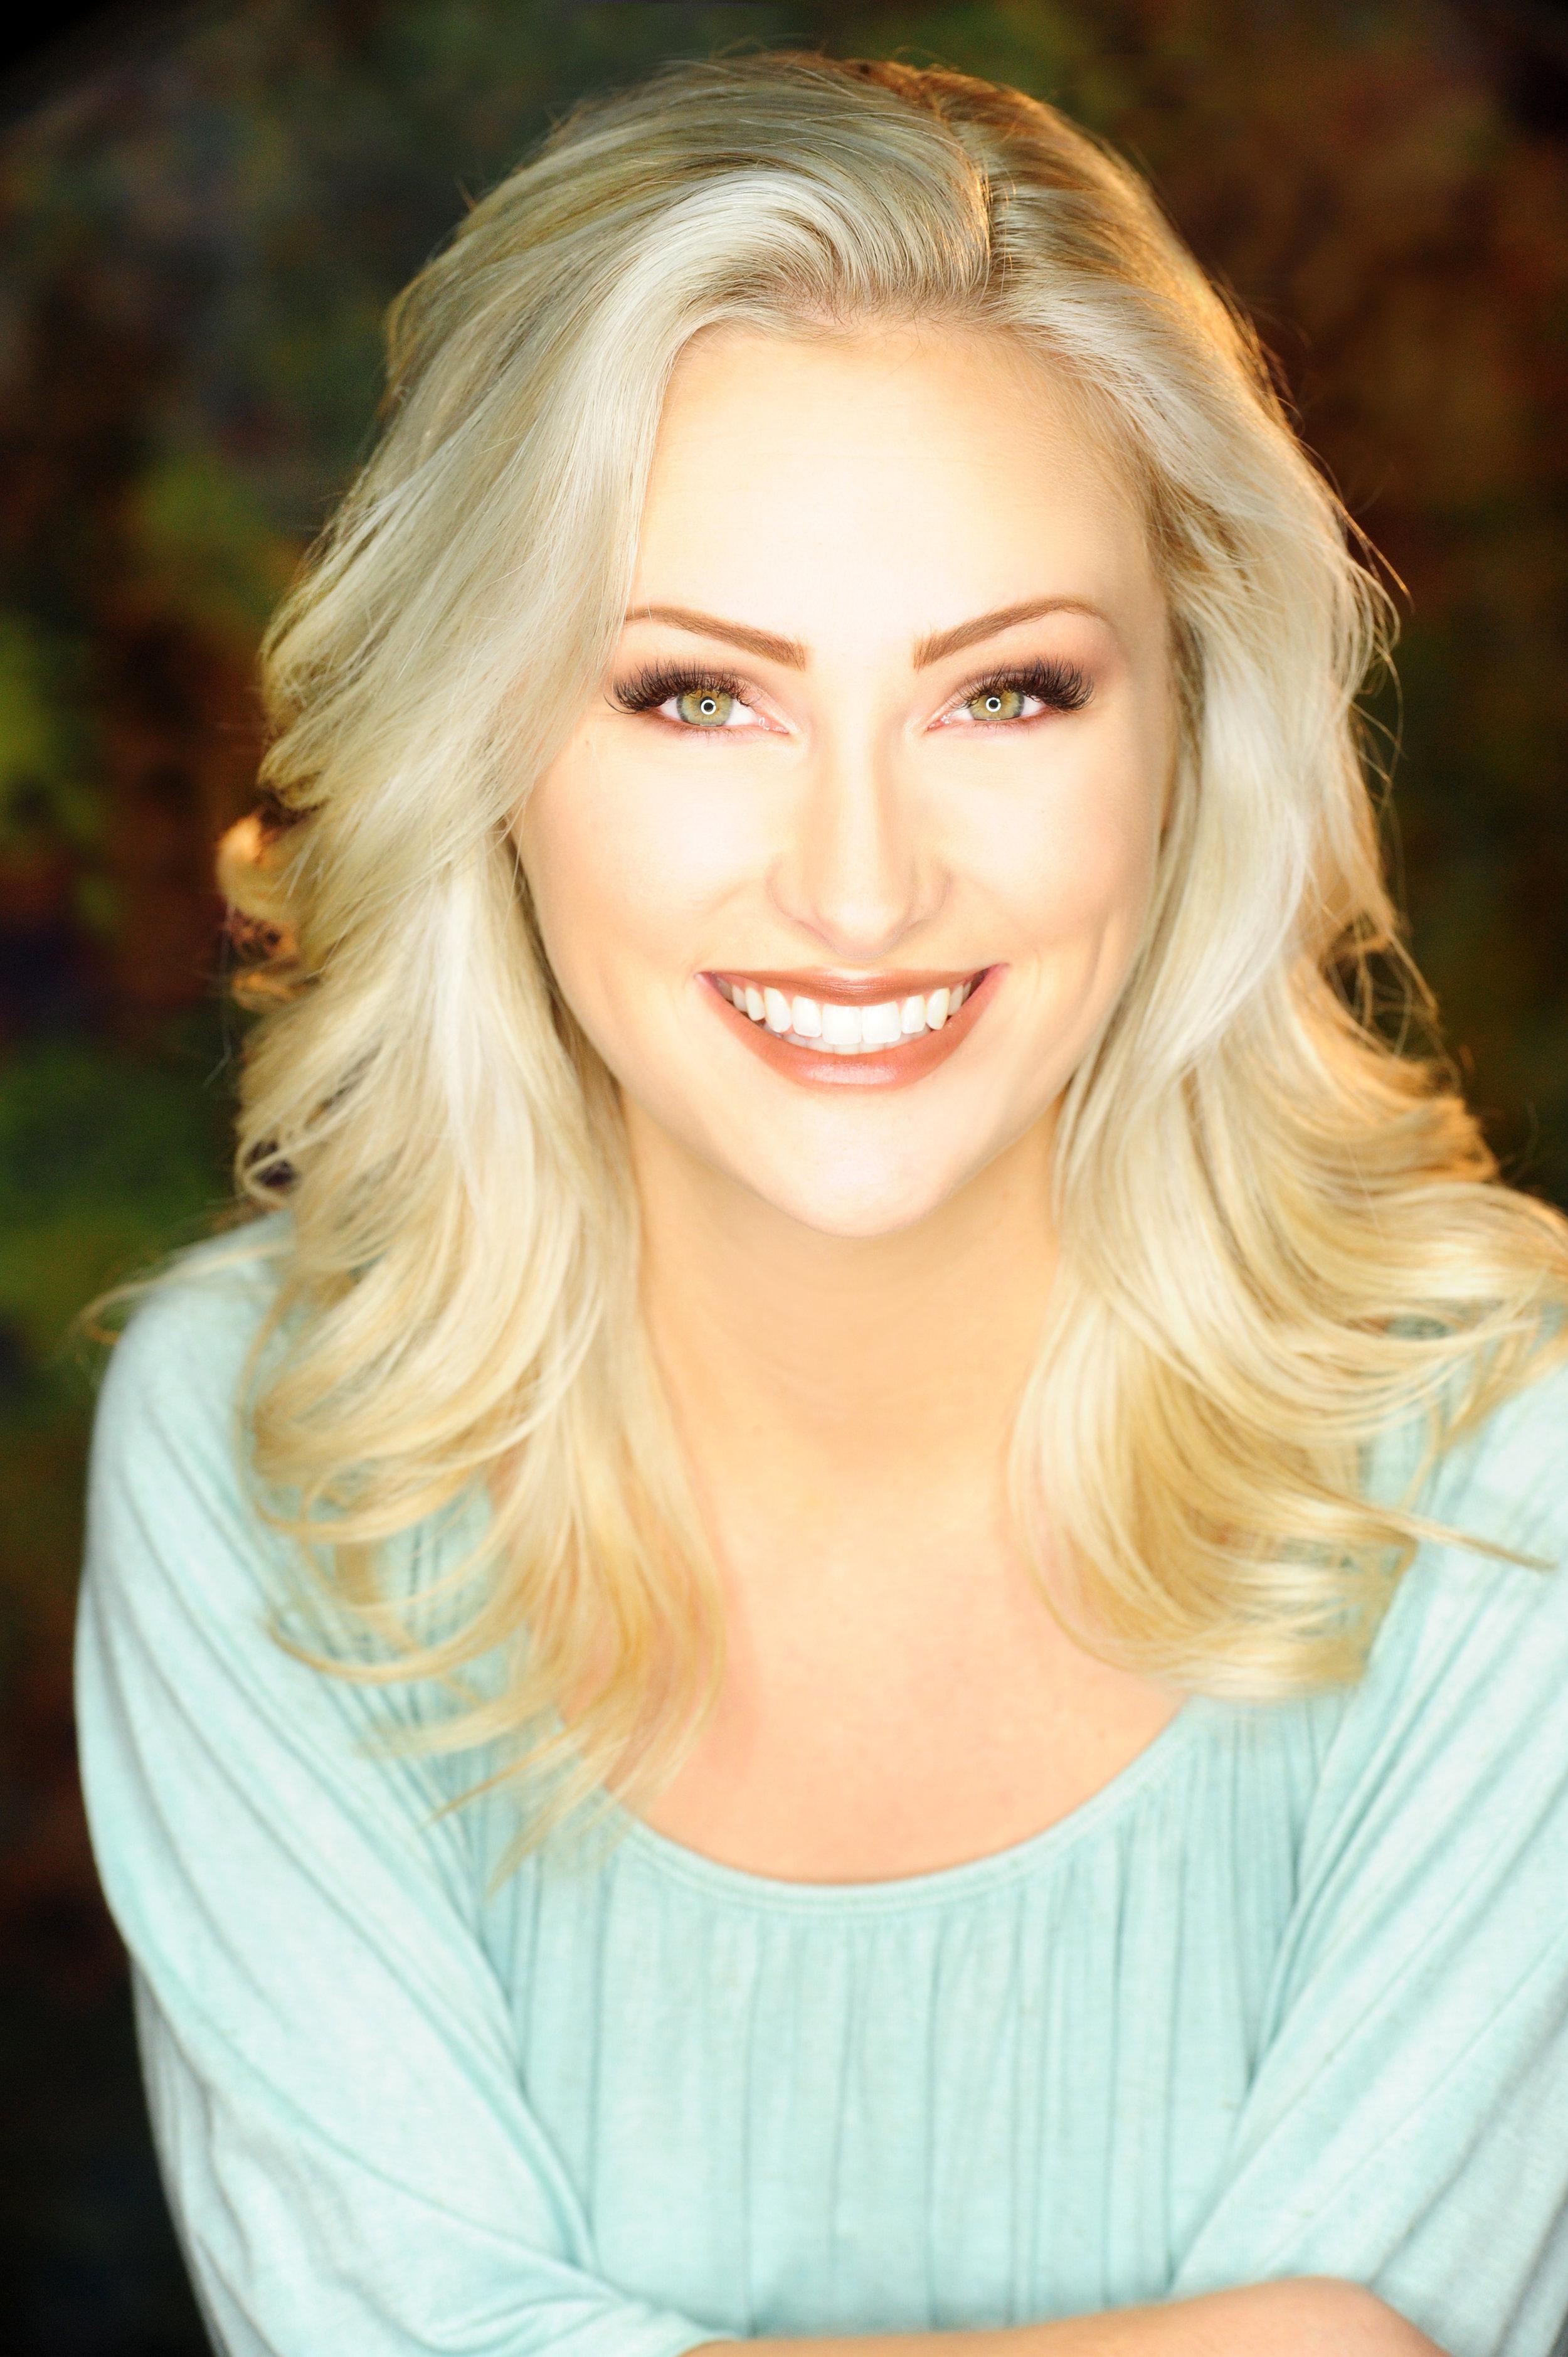 Hannah Uebele